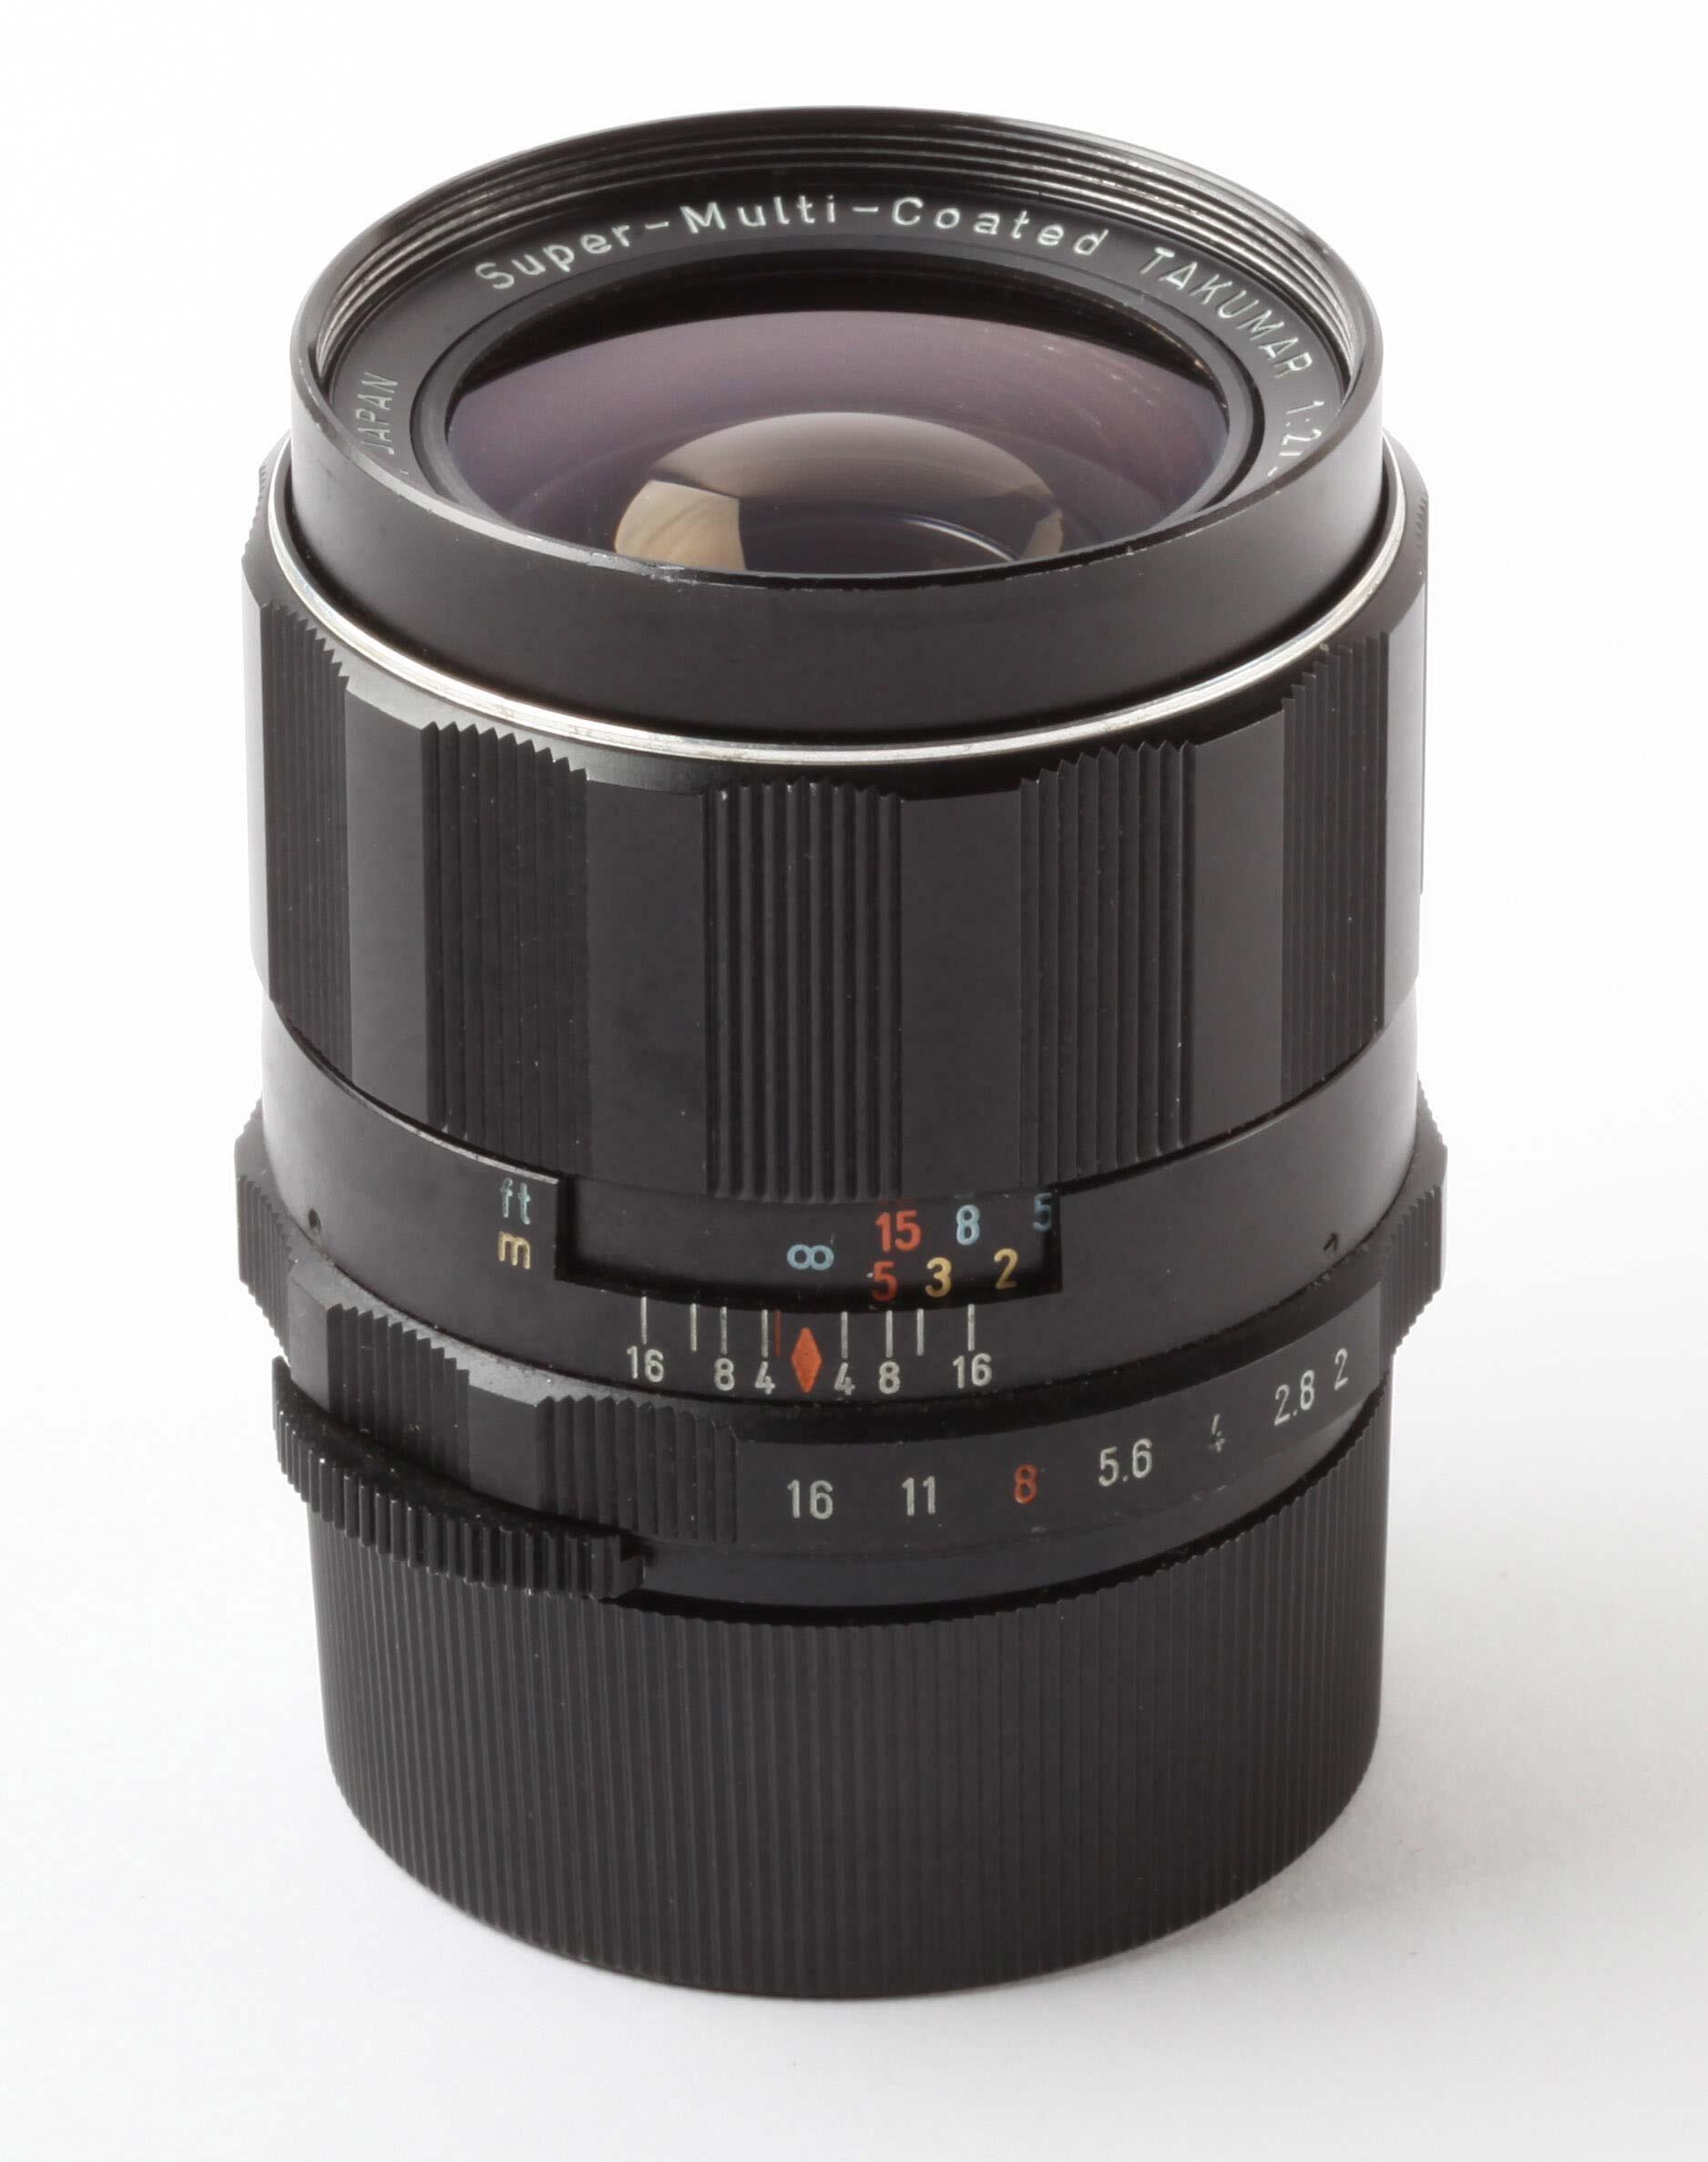 Pentax Super-Multi-Coated Takumar 2/35mm für PK